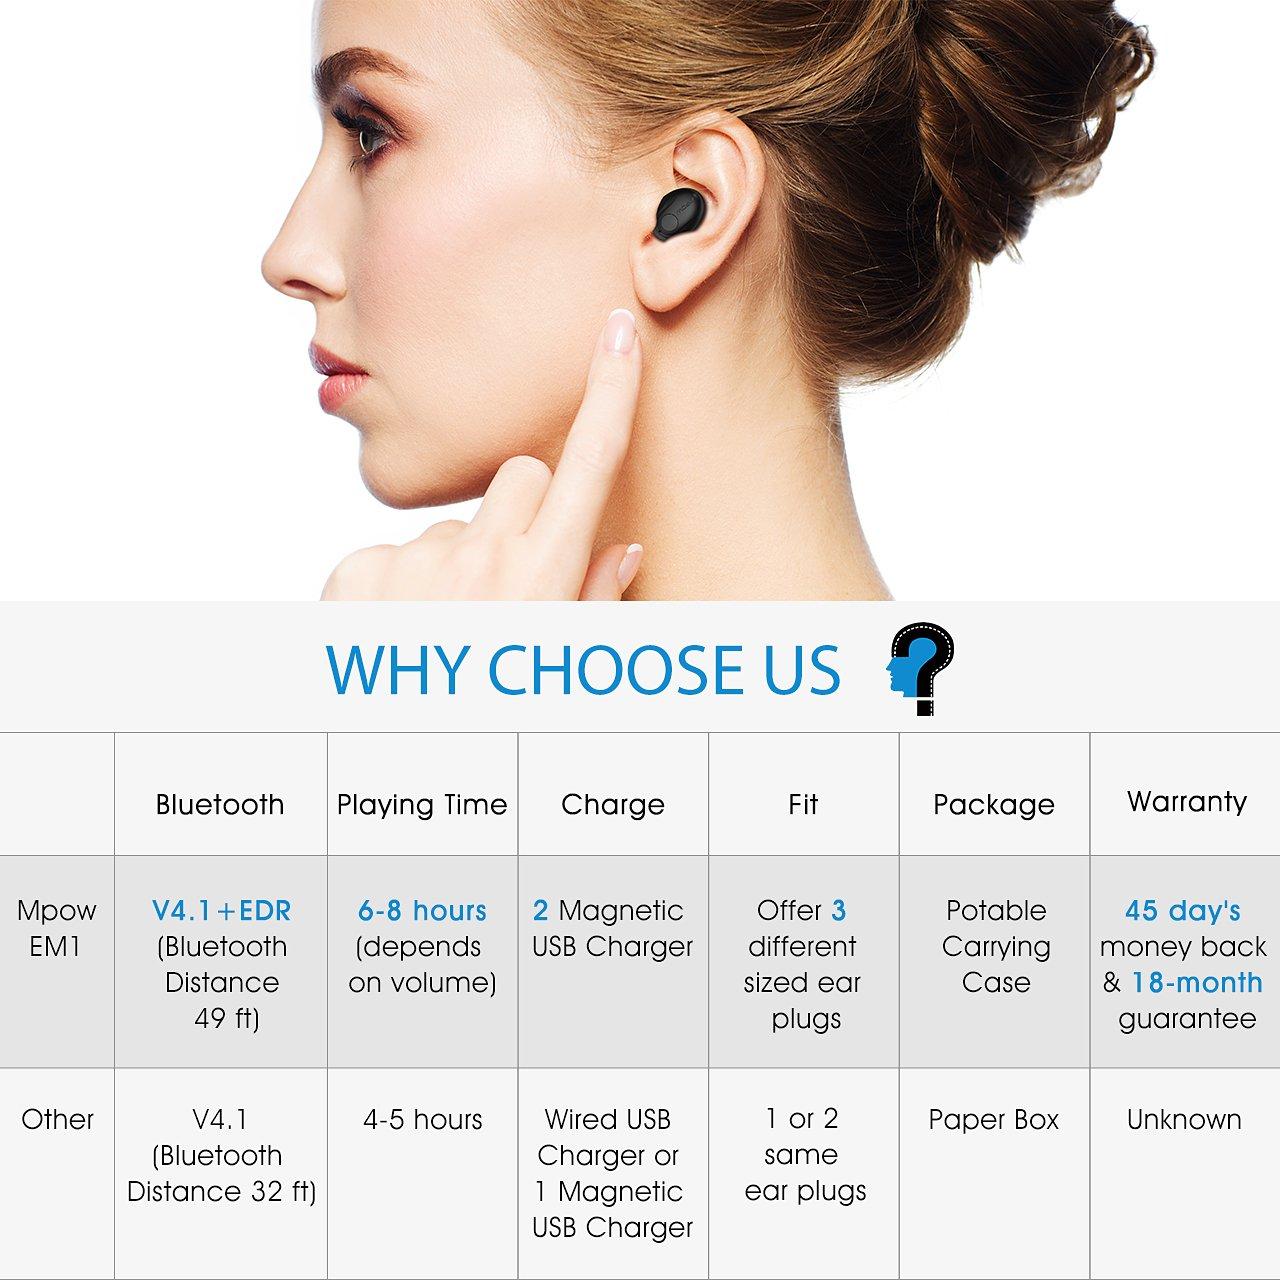 Mpow Bluetooth Earbud Wireless Phone Headset 41 Handsfree Headphones Mini L1 Sj0048 Electronics